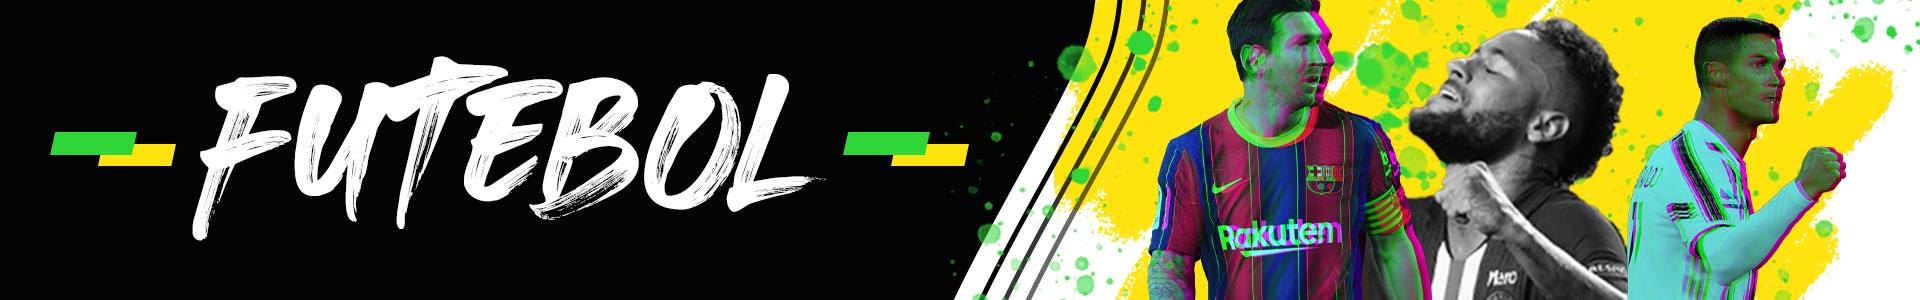 Sportbuzz Copa Do Brasil Fortaleza Sofre Com Expulsoes E Leva Empate Do Sao Paulo Nos Acrescimos